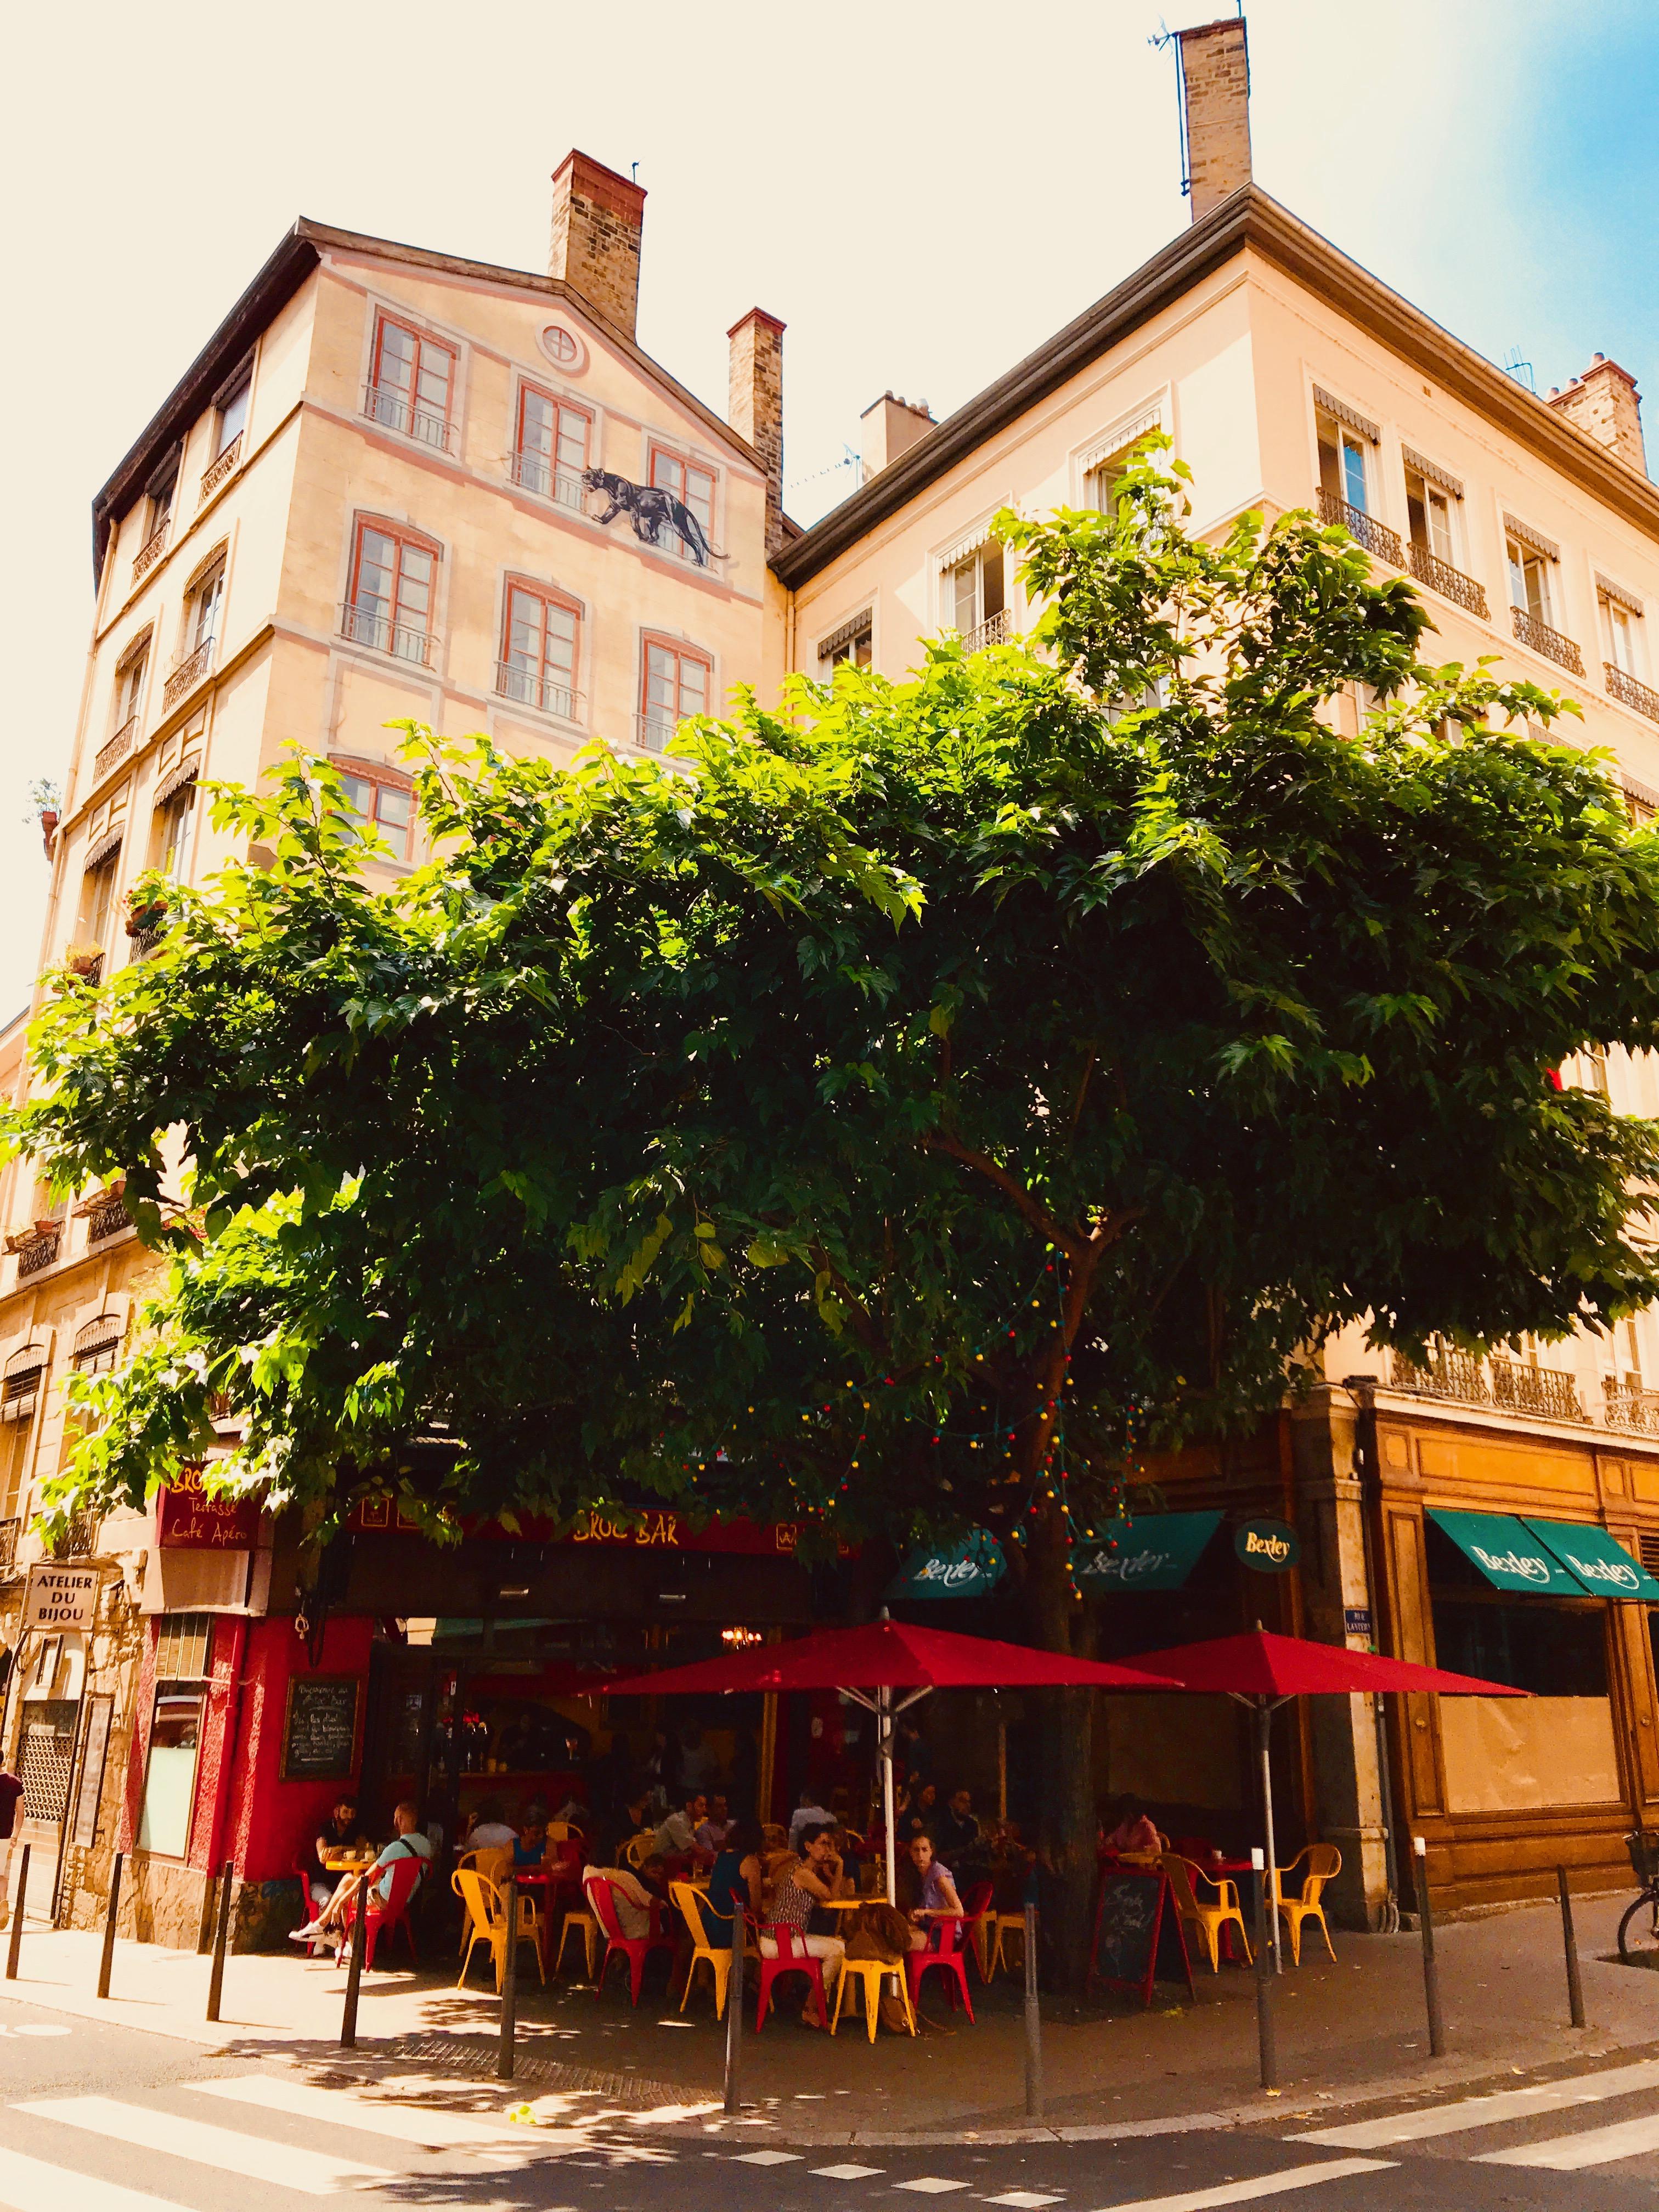 Outside Broc'Bar, Lyon.